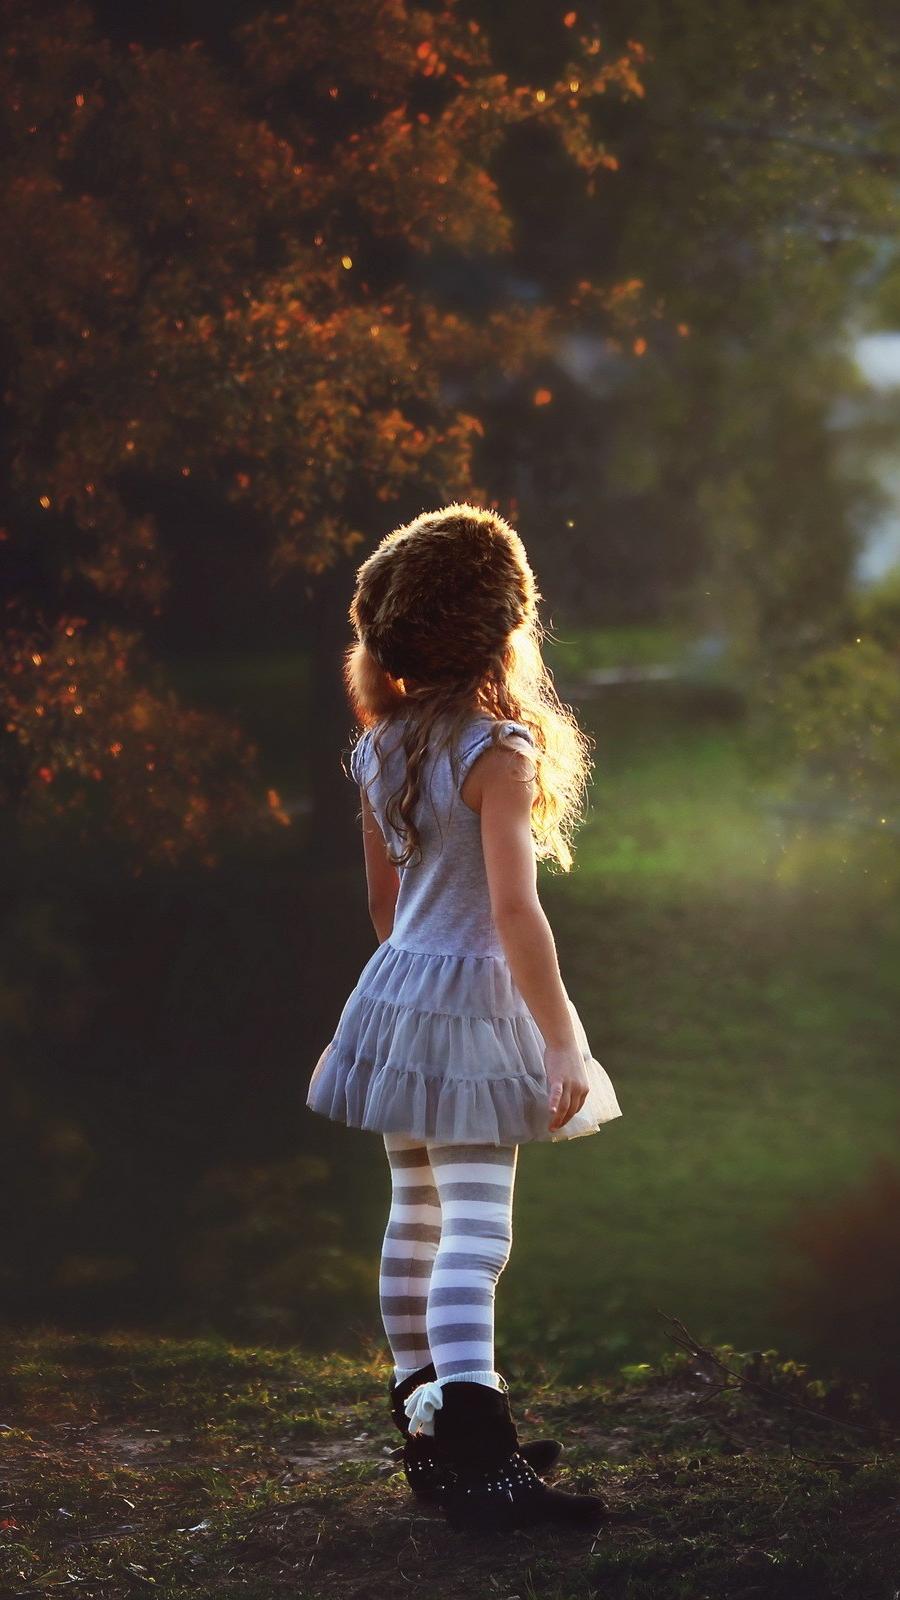 Little Cute Girl in Nature iPhone Wallpaper iphoneswallpapers com